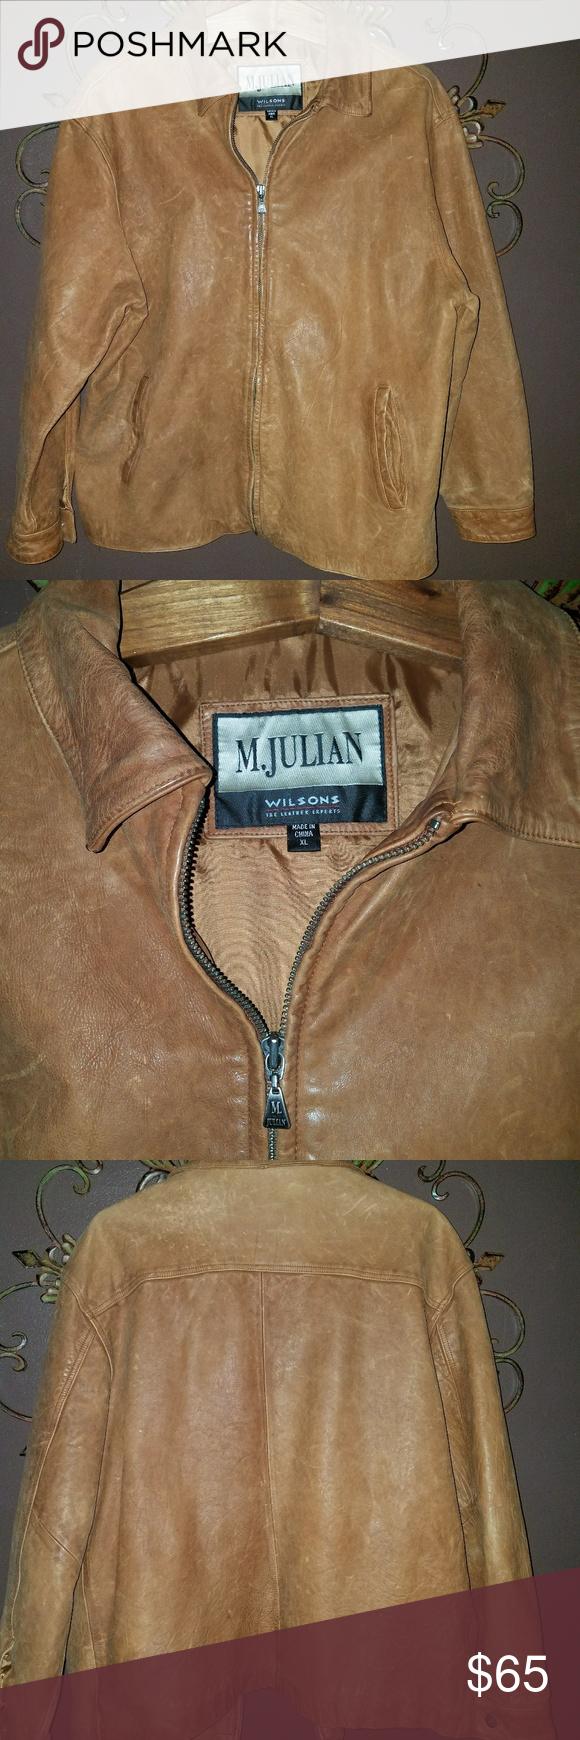 Mens Leather Jacket Mens M Julian Genuine Leather Jacket